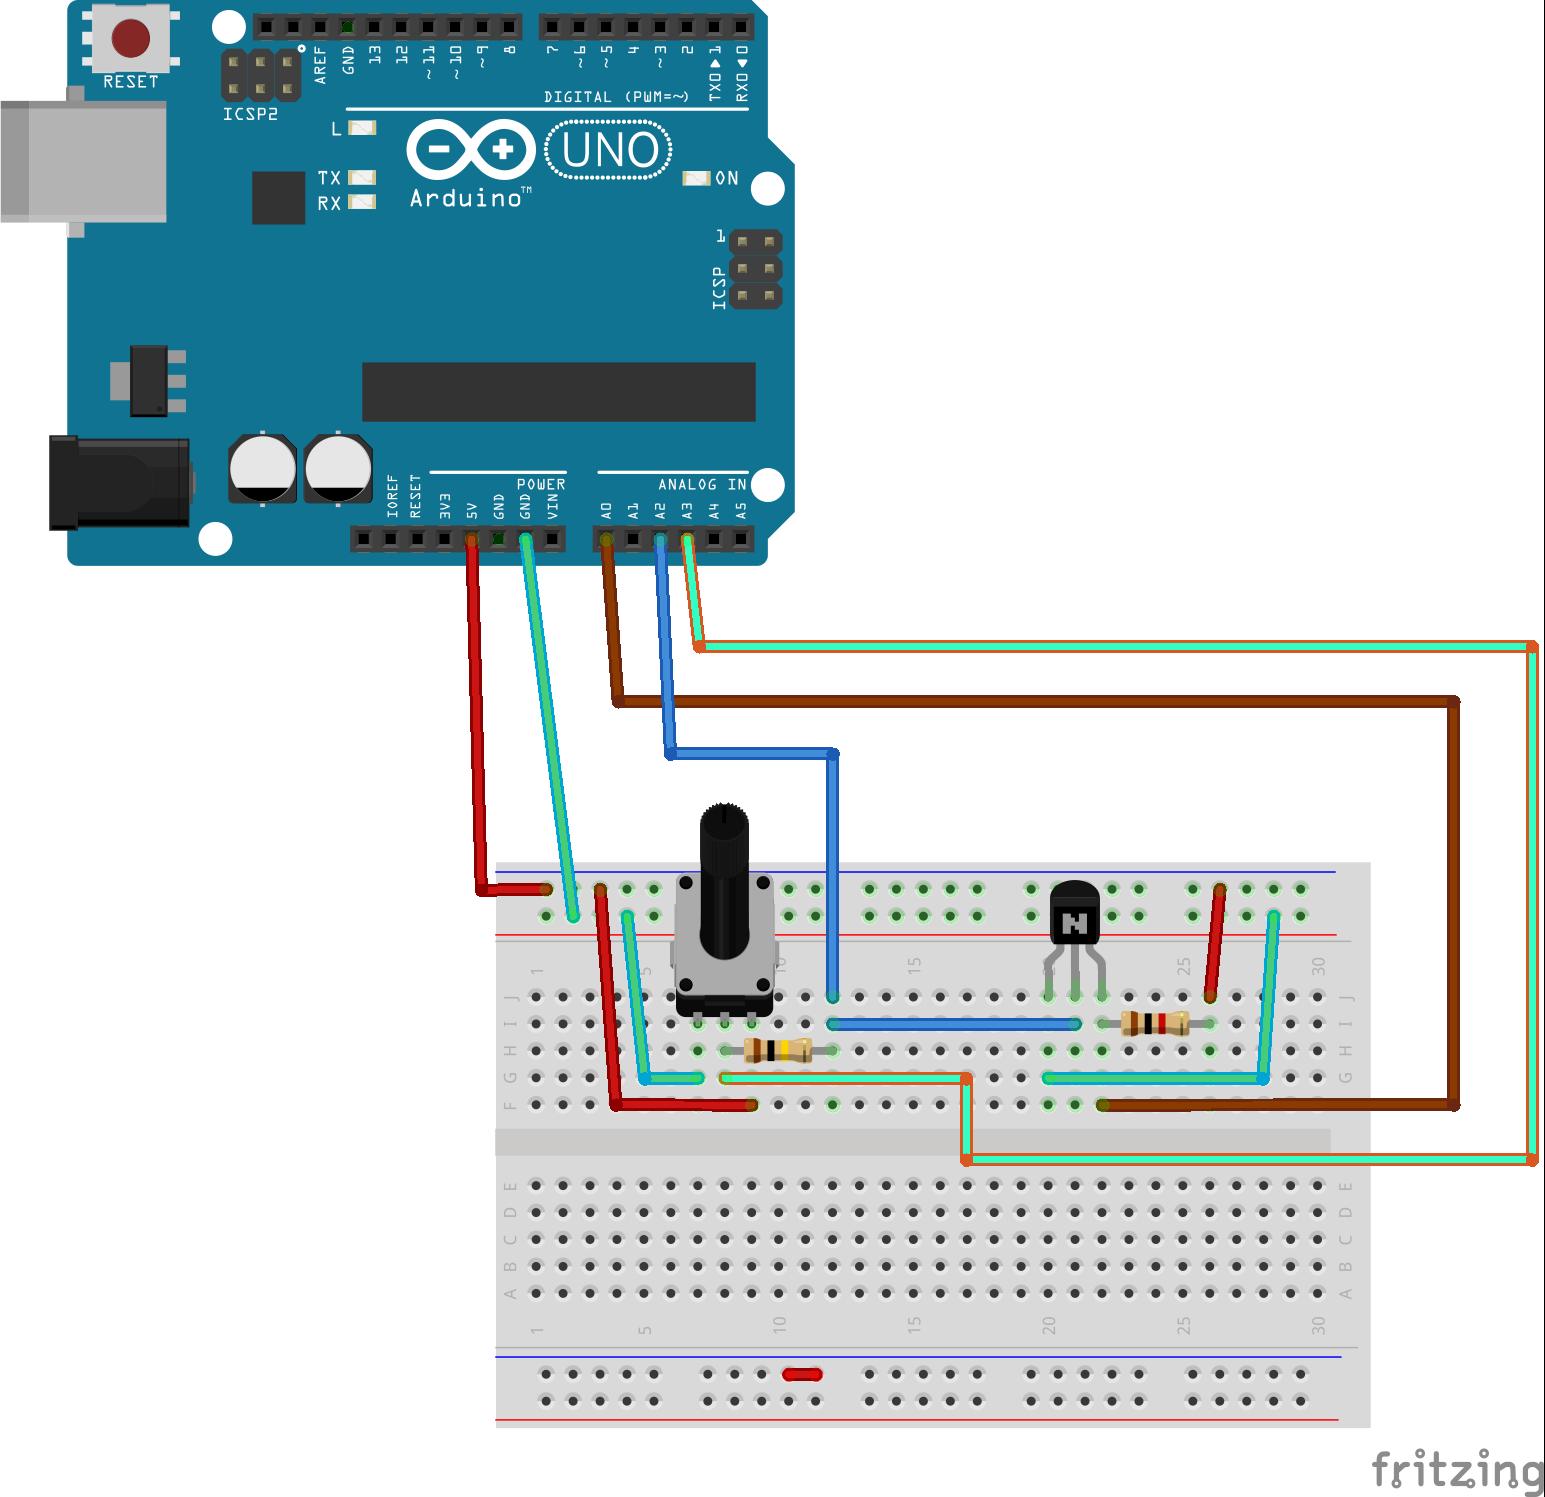 Diy Iv Curve Tracer Circuit Oscilloscope Ioblocks Build A Simple Transistor Using An Arduino